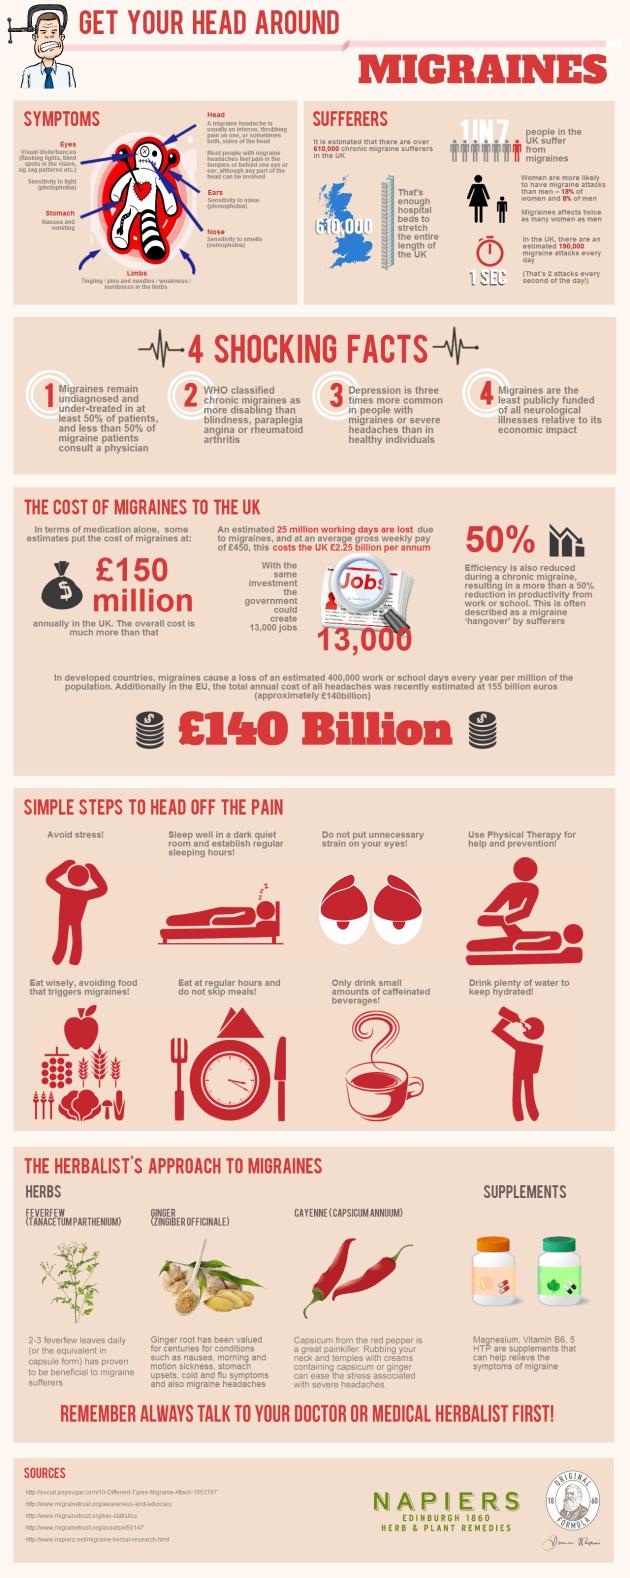 Get Your Head Around Migraines Infographic